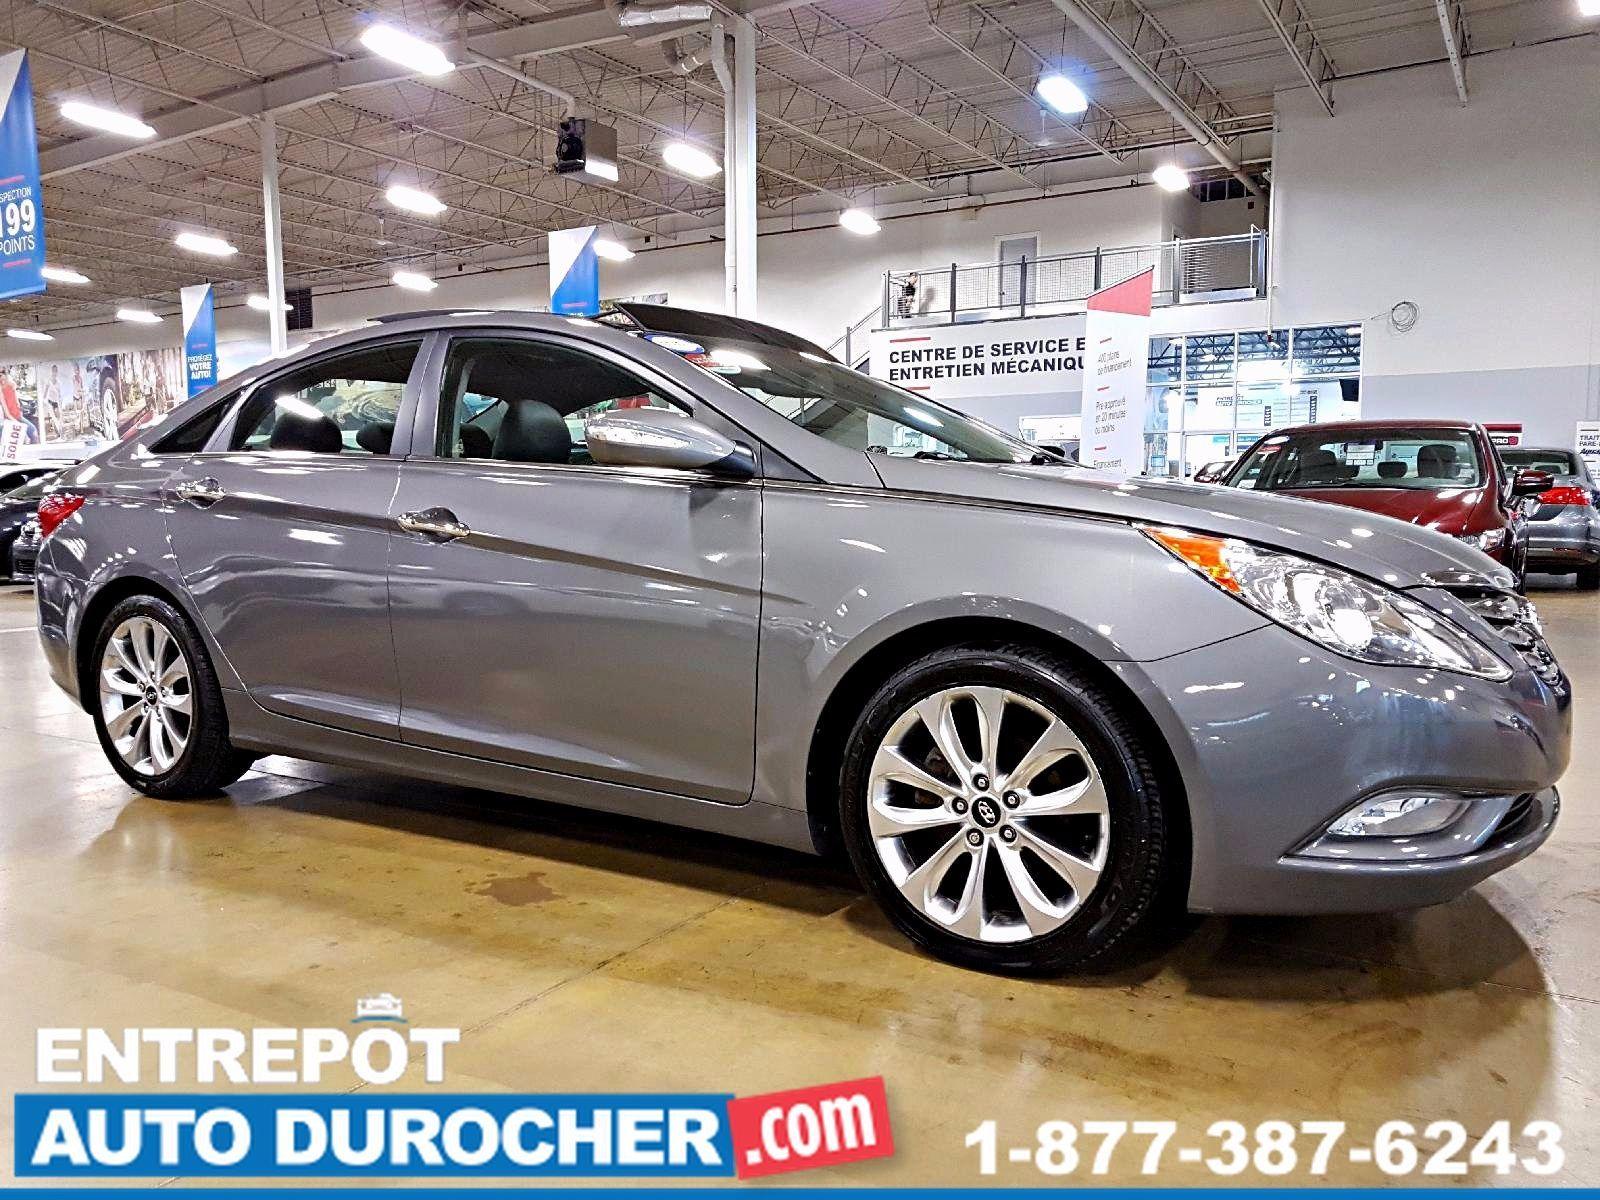 2012 Hyundai Sonata AUTOMATIQUE - AIR CLIMATISÉ - CUIR - TOIT OUVRANT